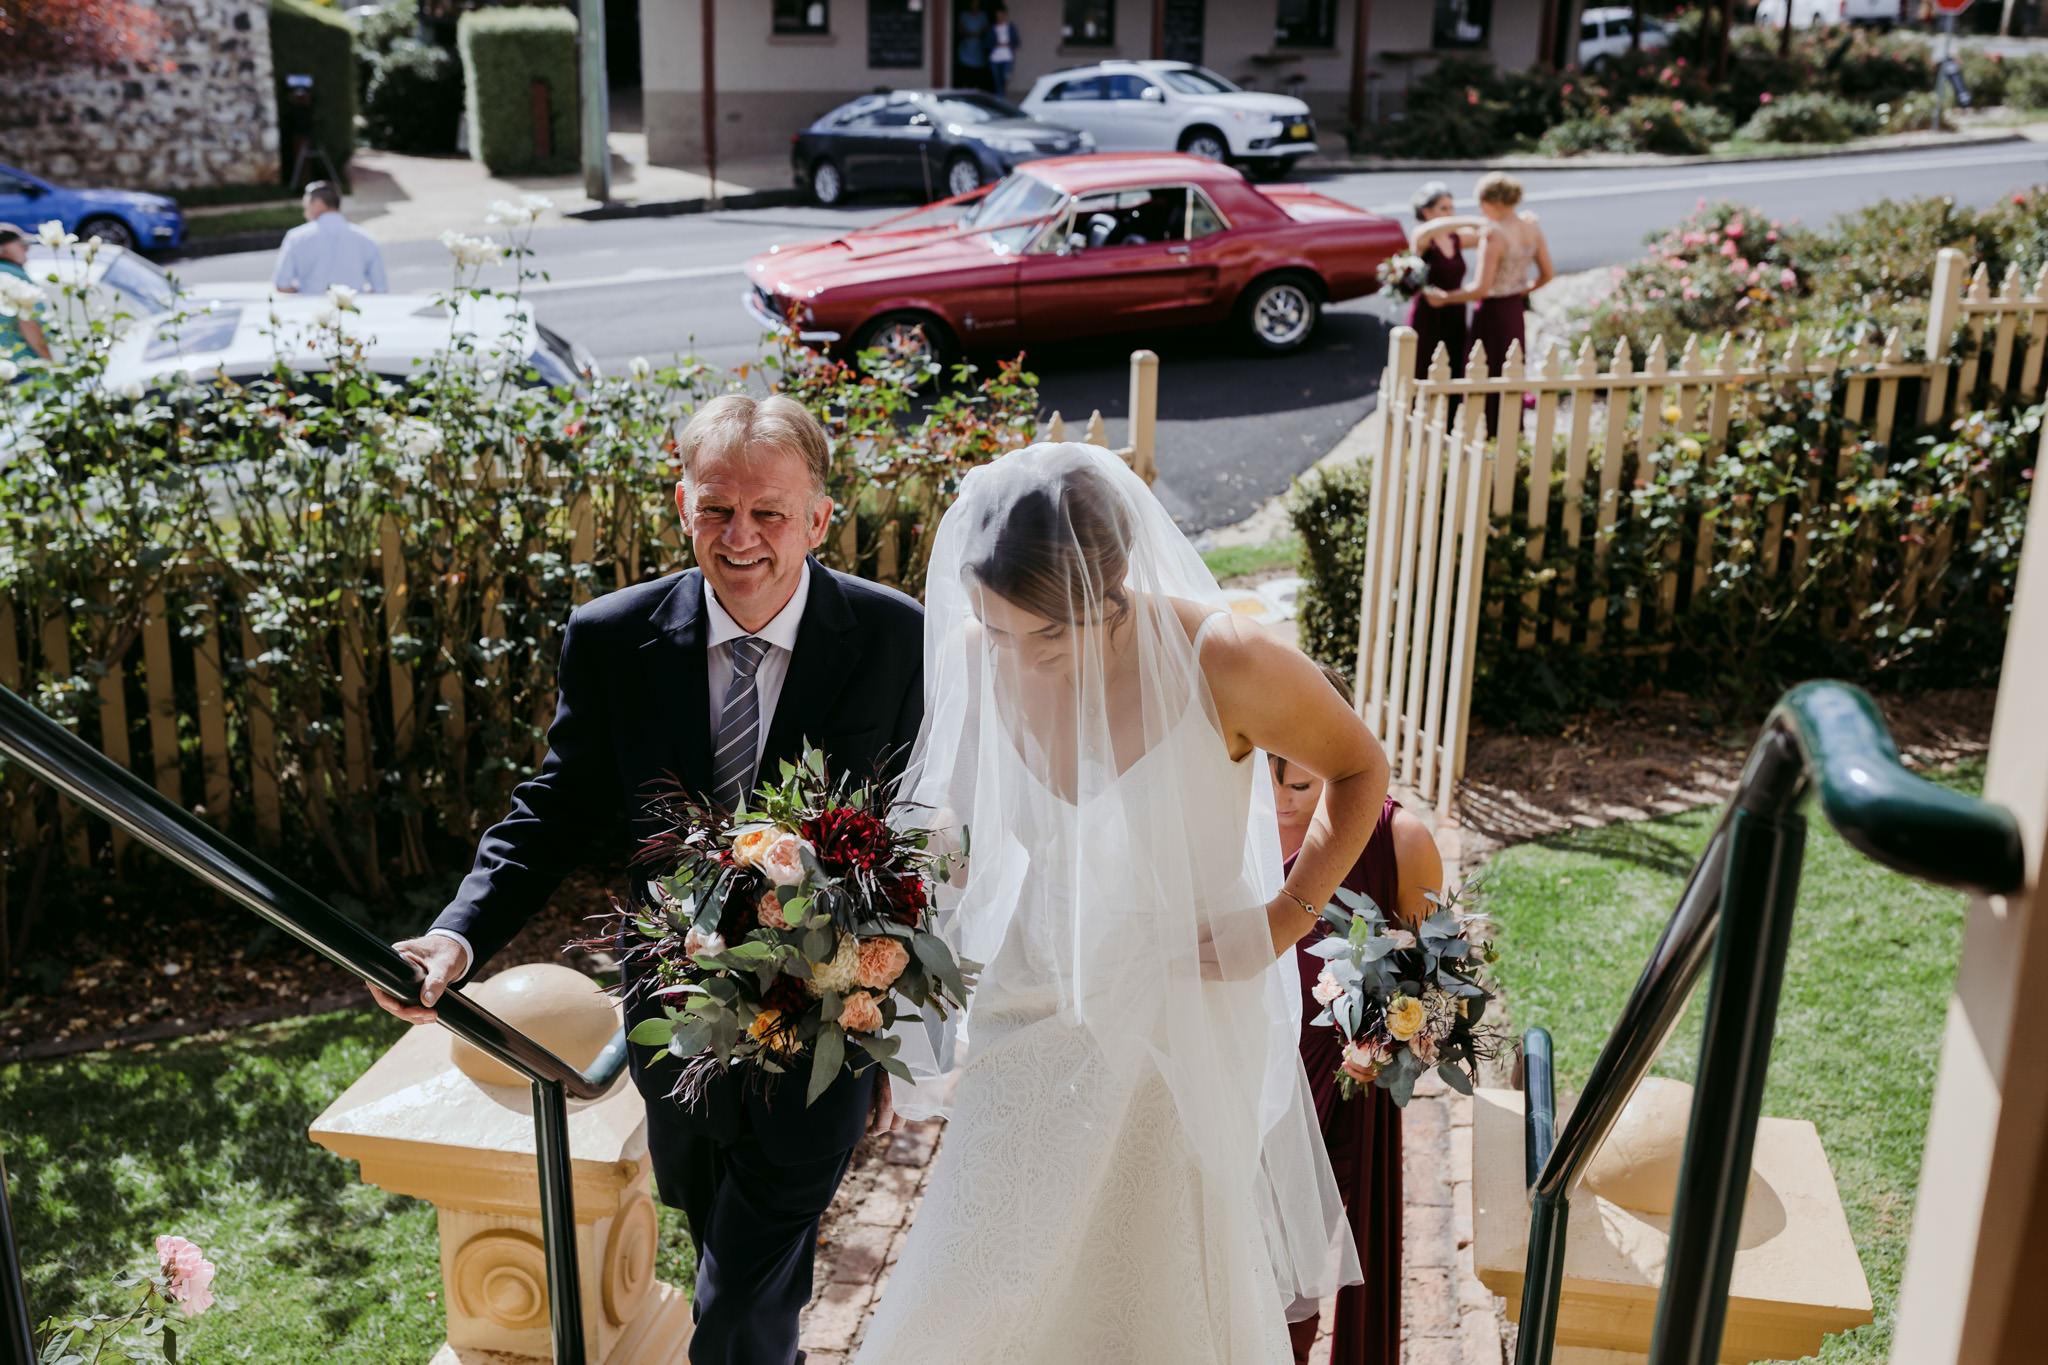 Erin Latimore Mudgee Canberra Wedding Photographer ROSEBANK GUESTHOUSE OLD THEATRE TONIC MILLTHORPE_179.JPG